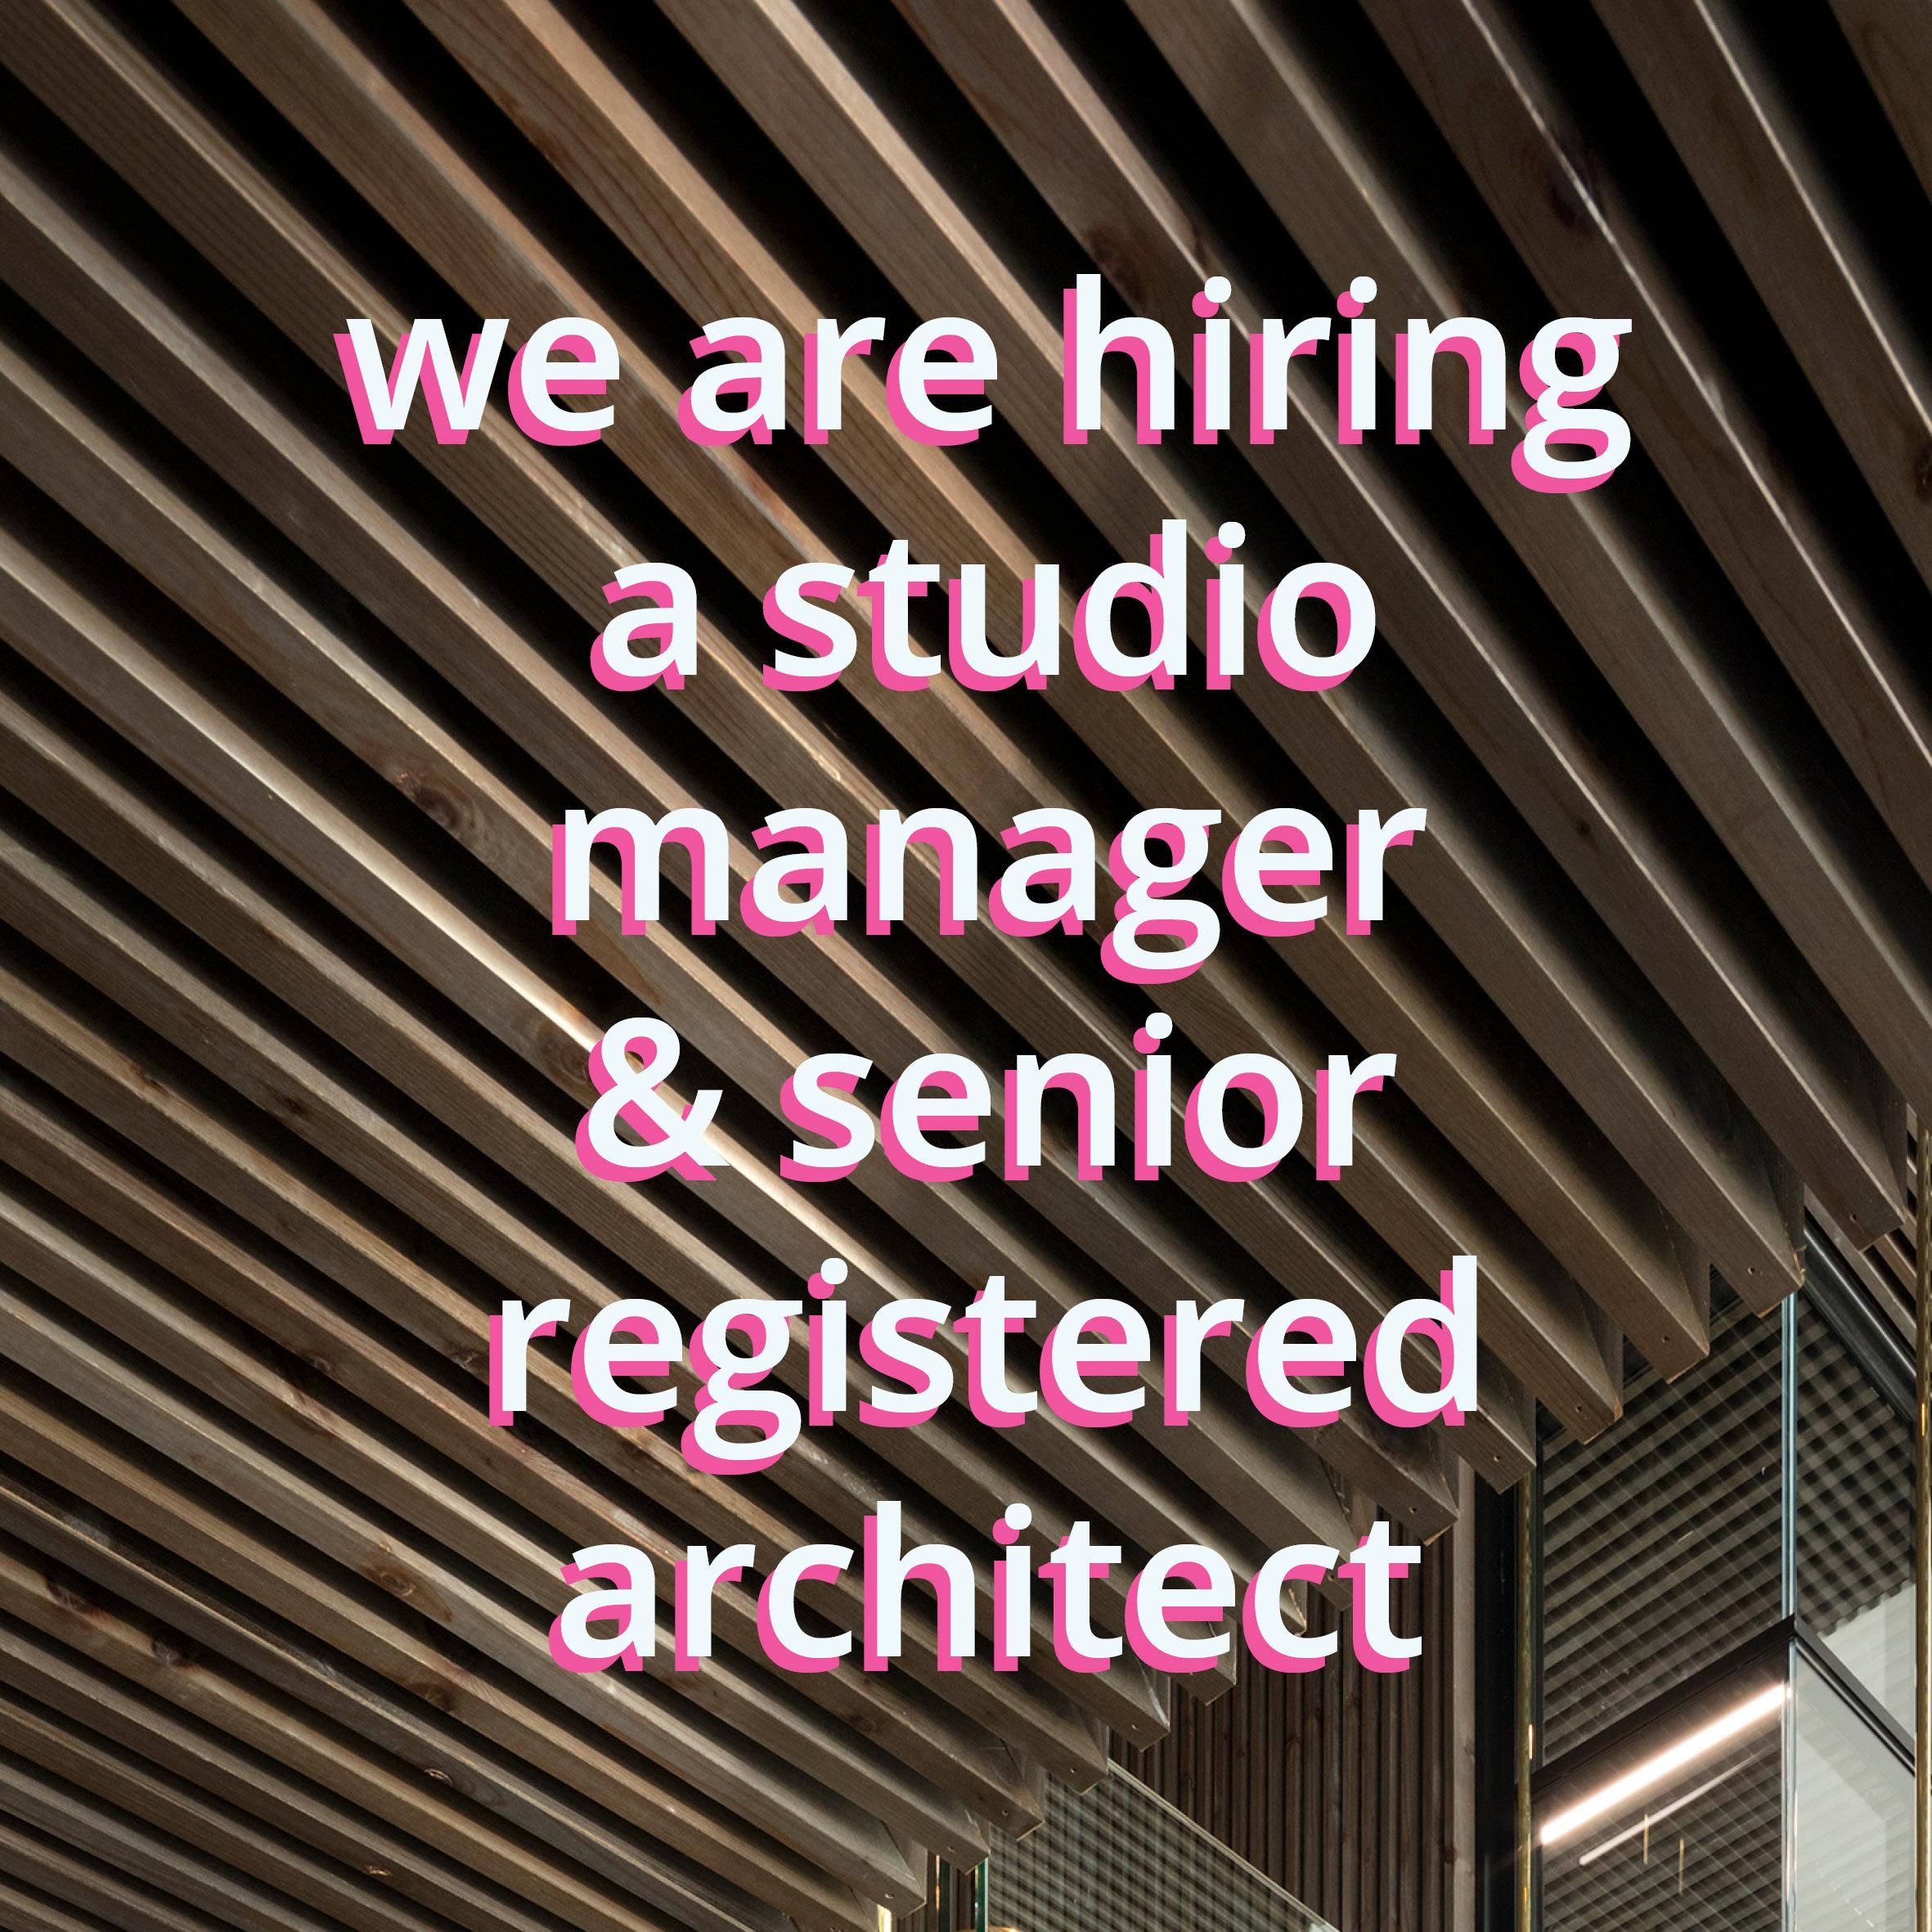 hiring banner.jpg